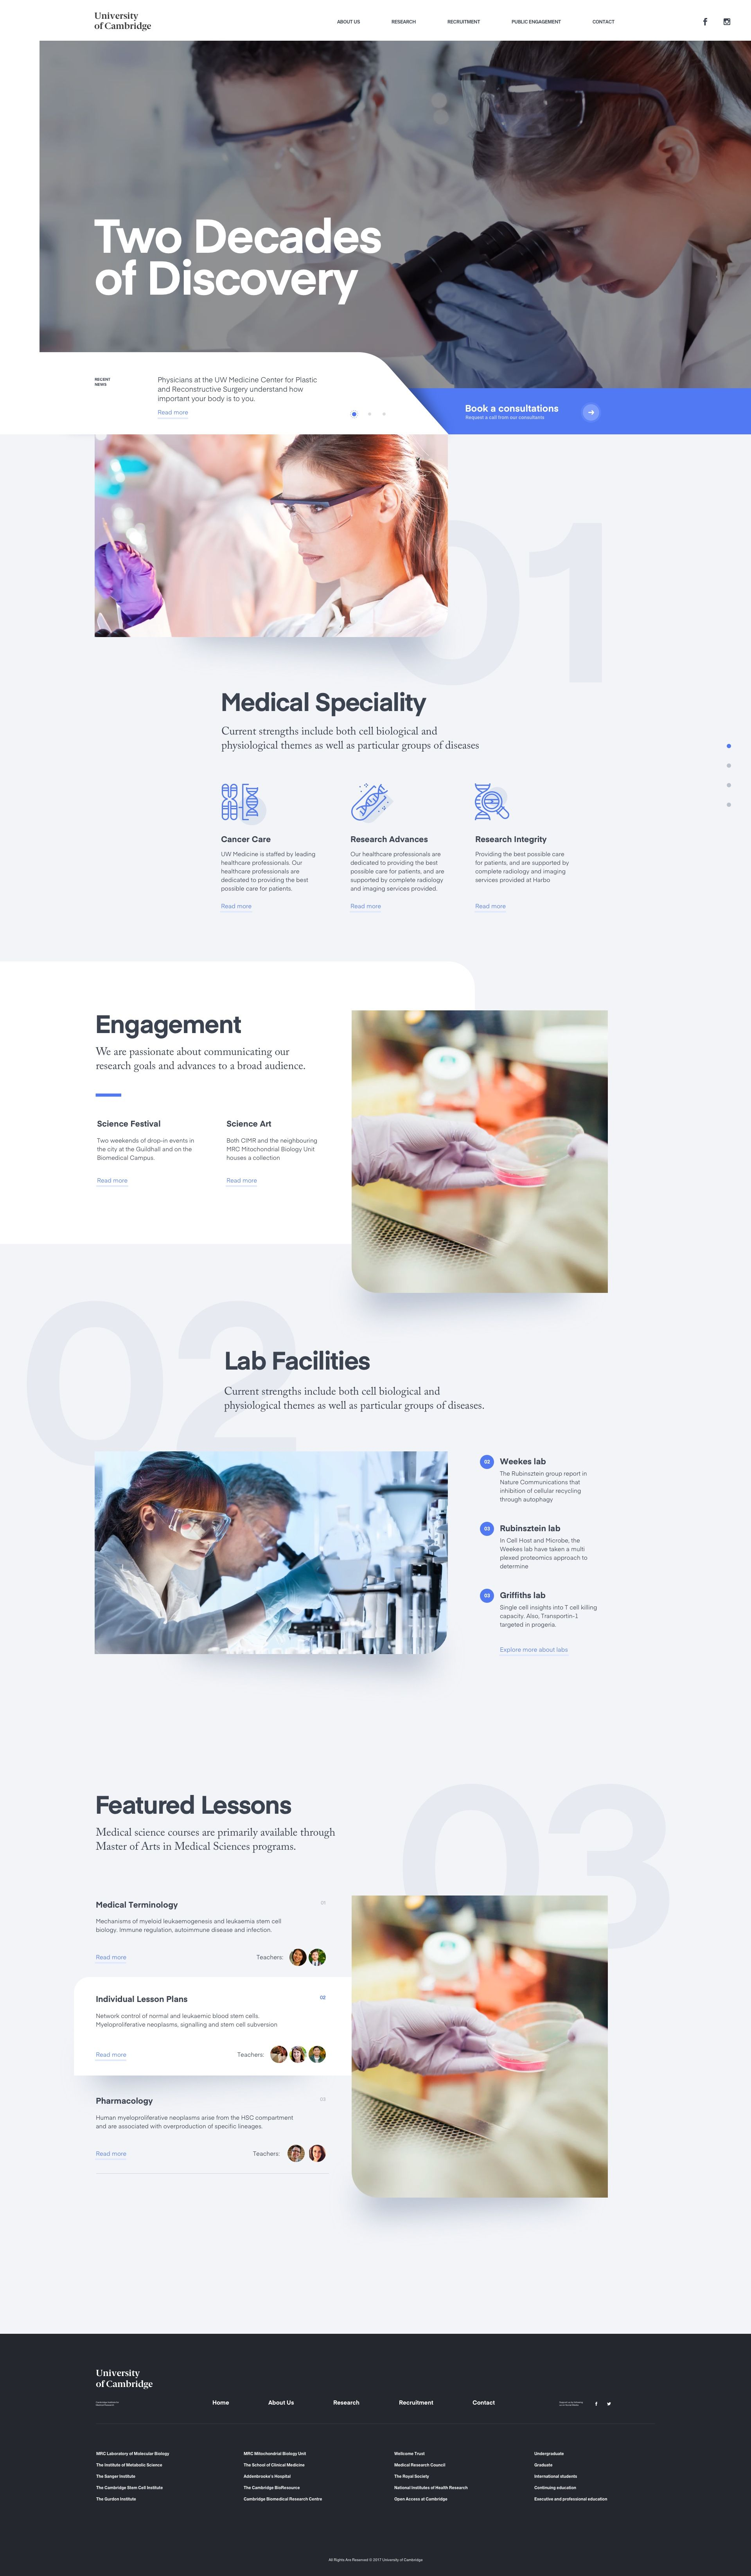 University Of Cambridge Full Screen Web App Design Web Design University Website